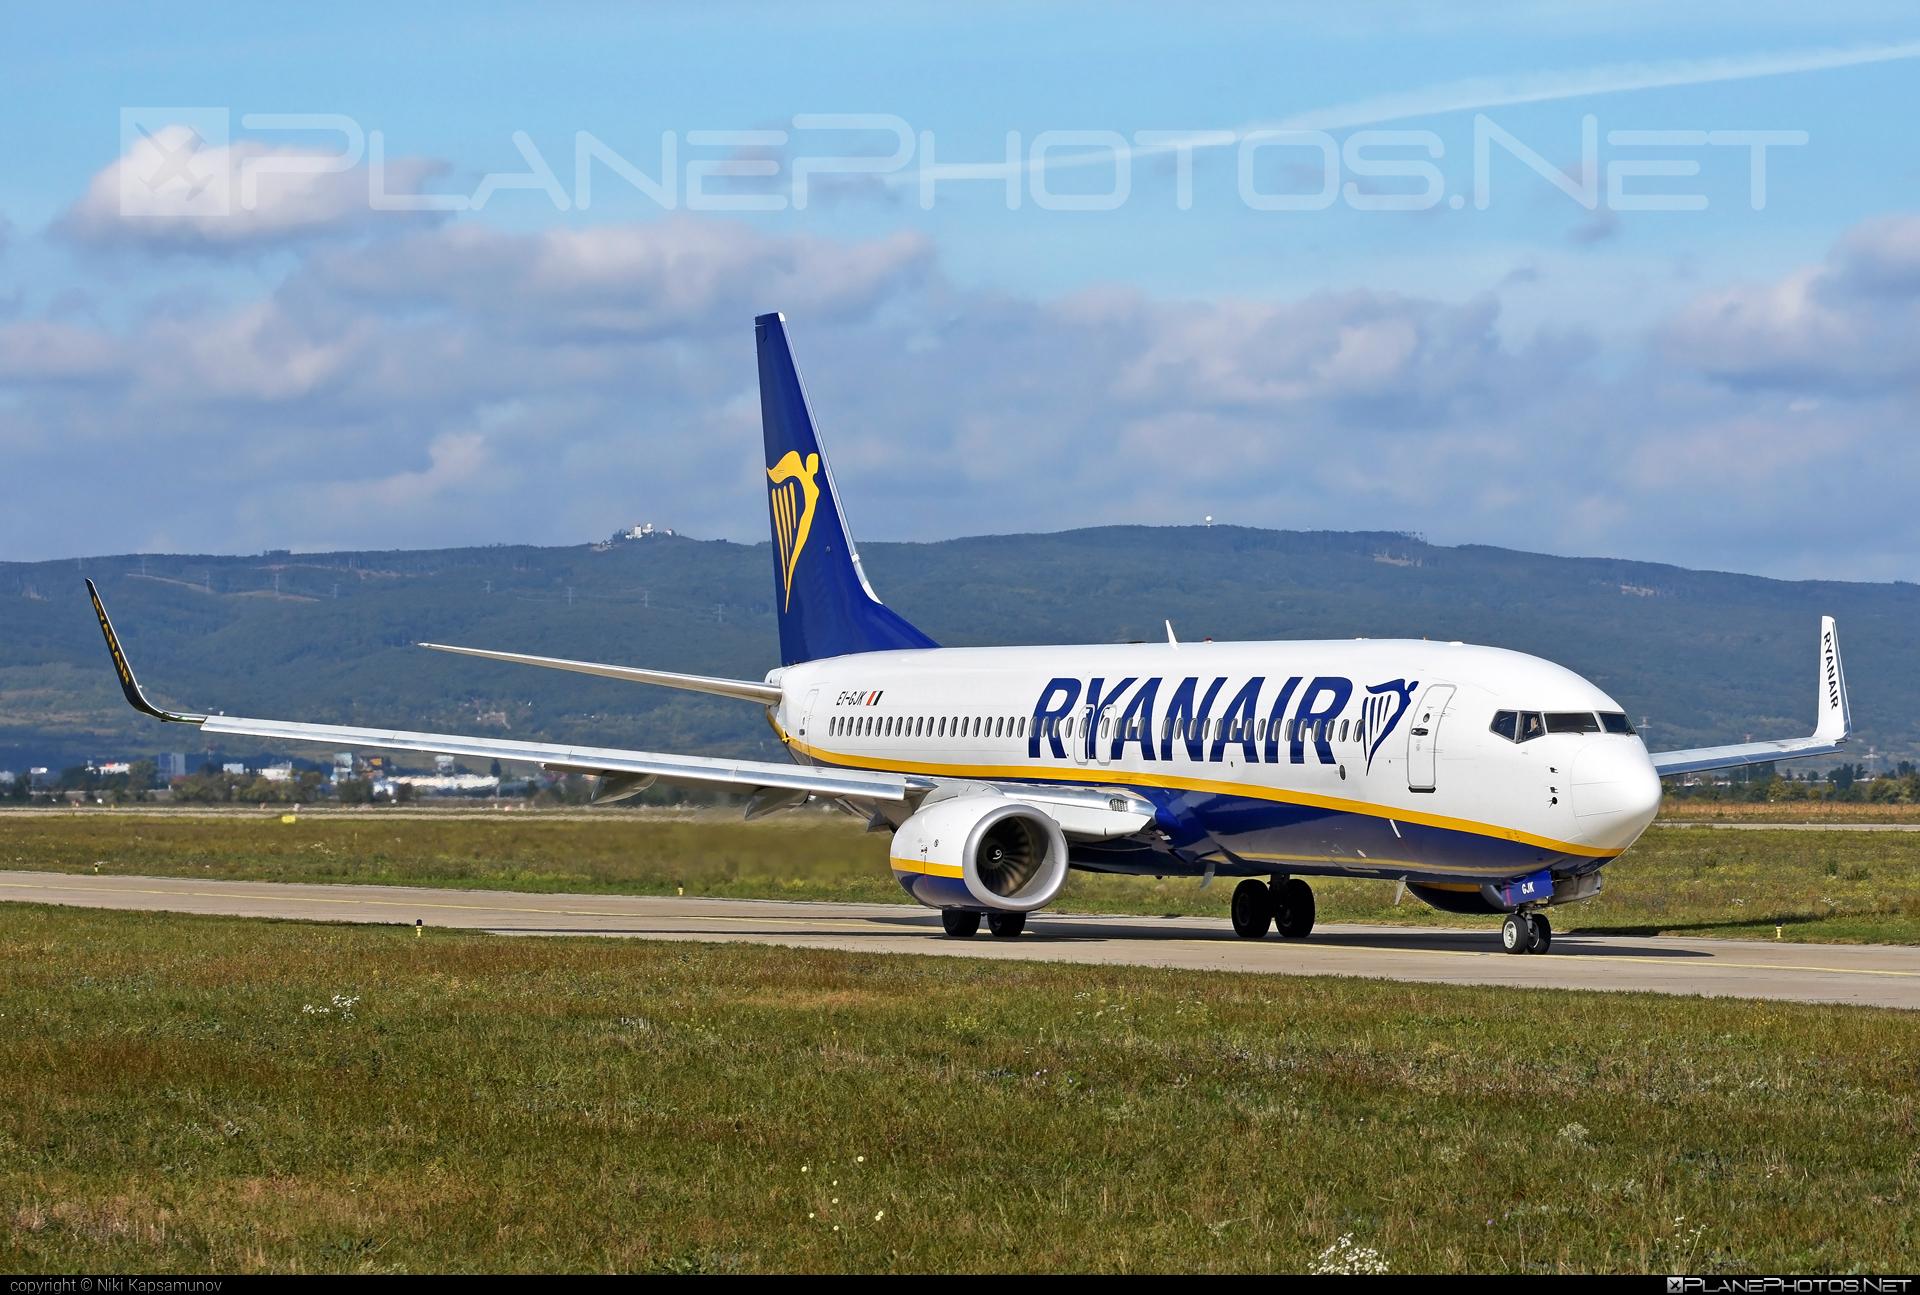 Boeing 737-800 - EI-GJK operated by Ryanair #b737 #b737nextgen #b737ng #boeing #boeing737 #ryanair